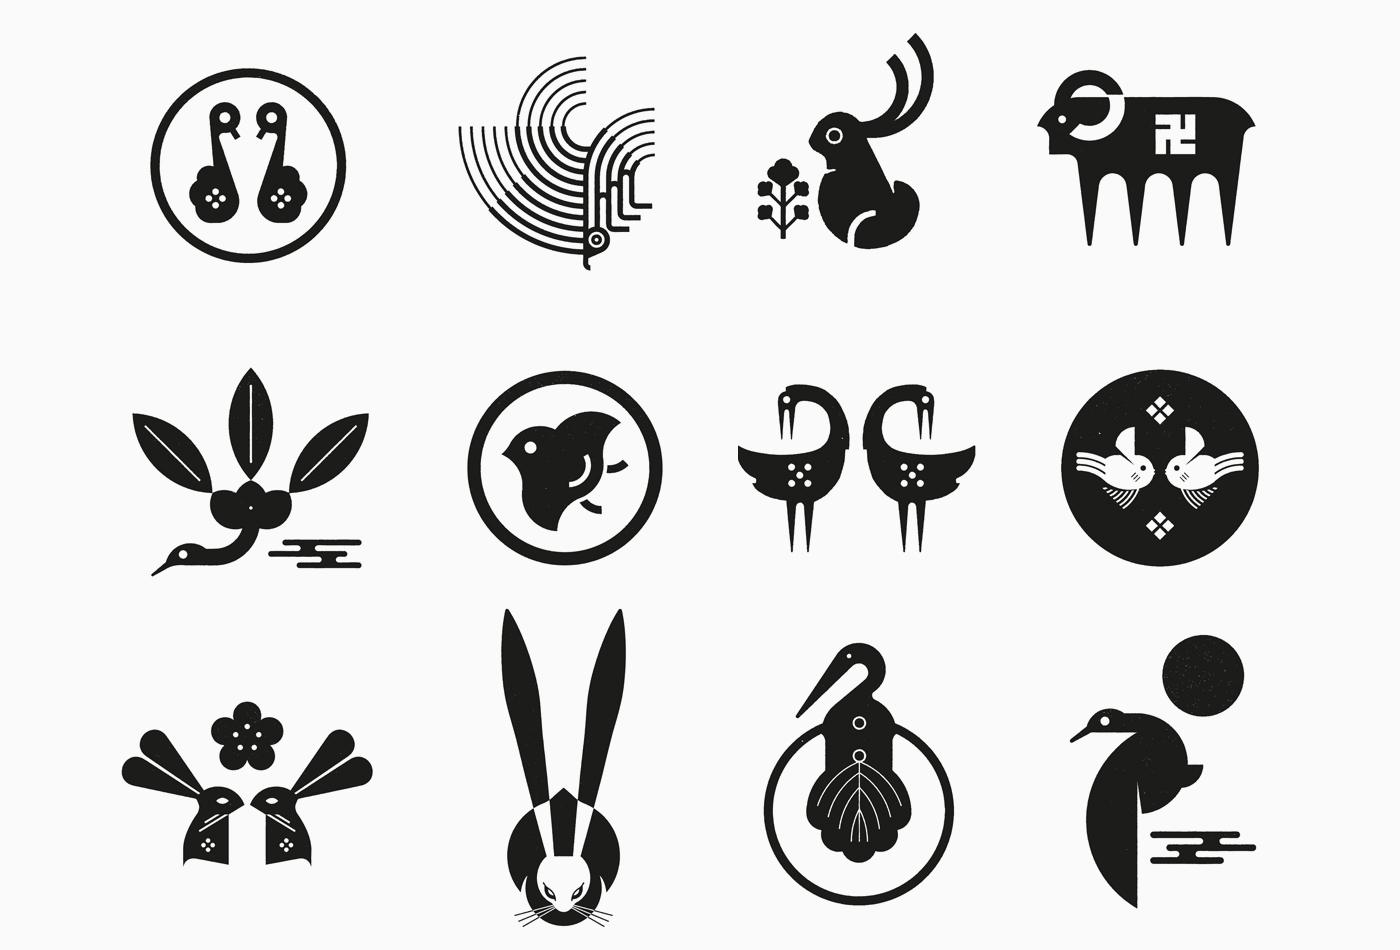 05-japanese-japan-iconography-hiroshima-mon-amour-kamon-crest-vacaliebres copia